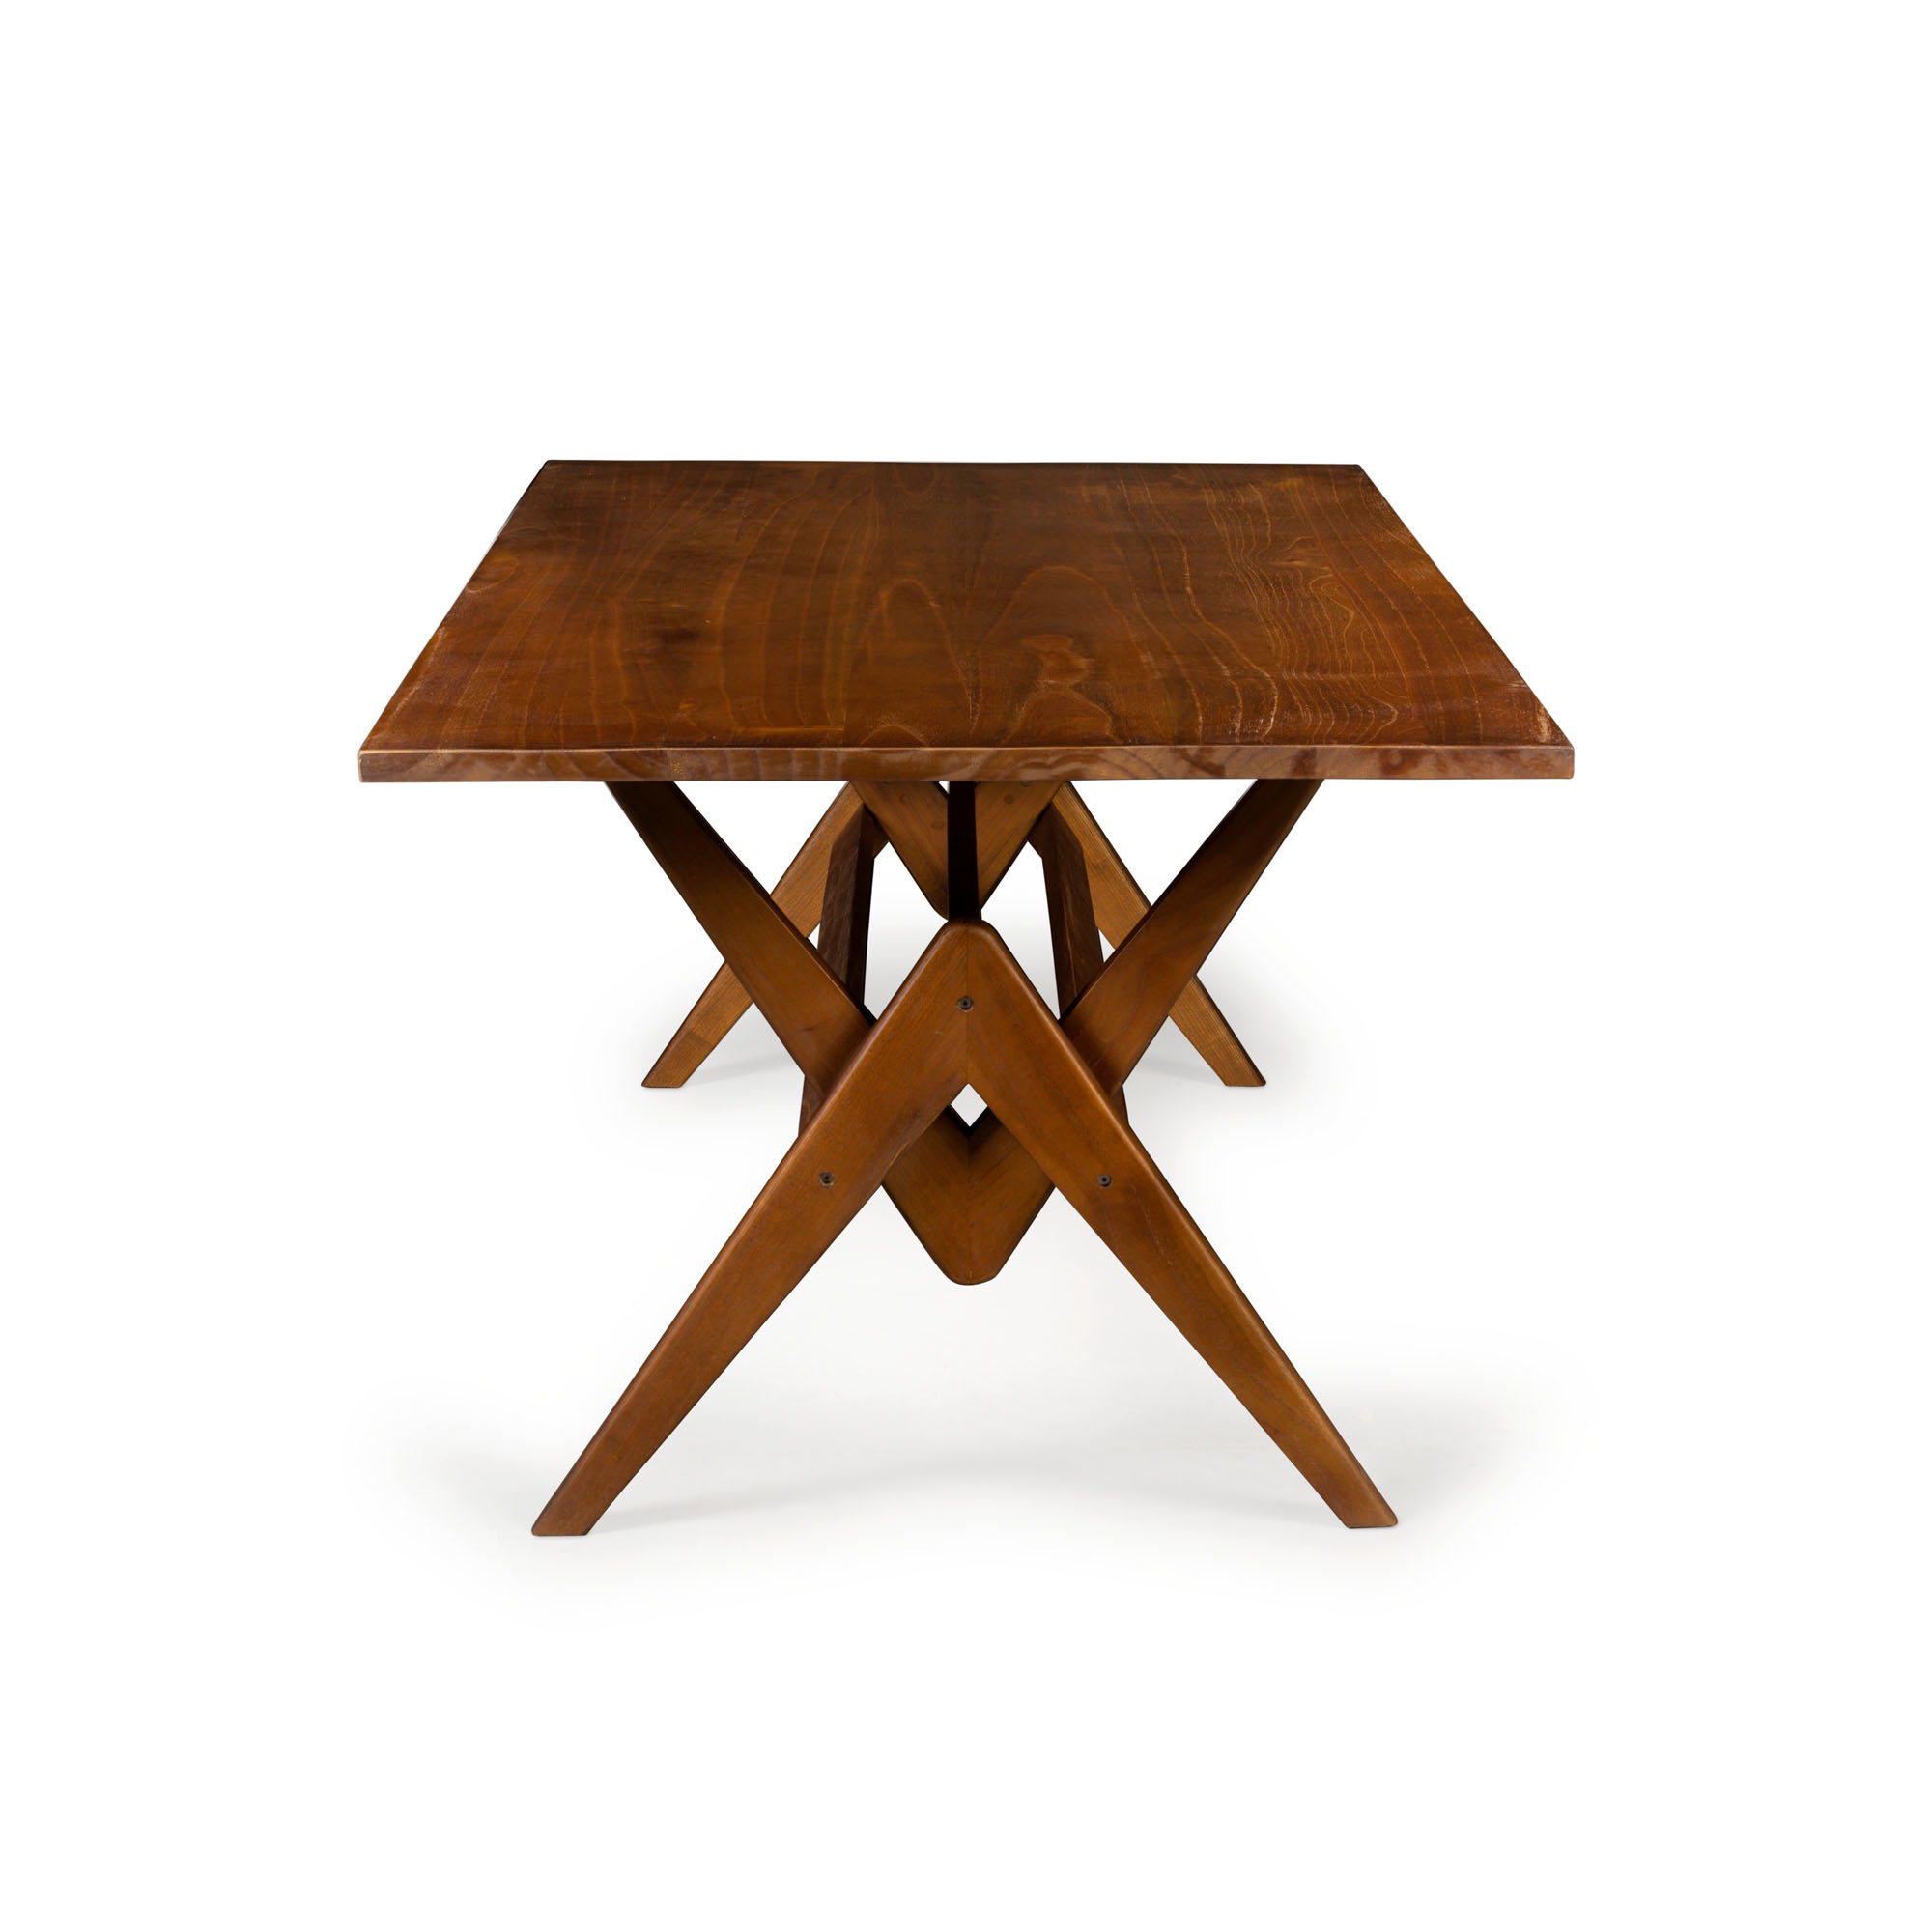 Dining Table W.T.H. 180 -  Darkened Teak-1